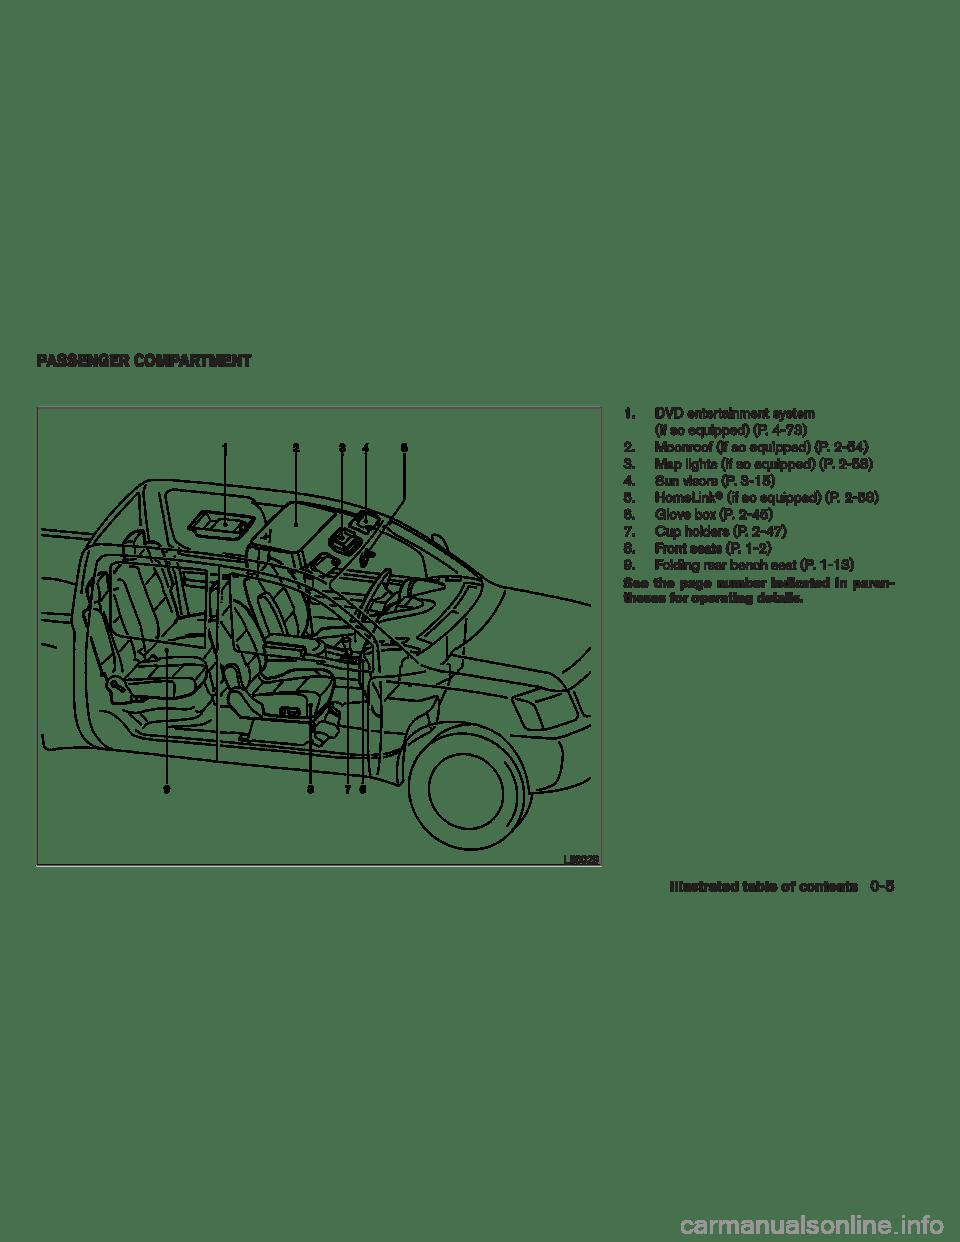 NISSAN TITAN 2014 1.G Owners Manual